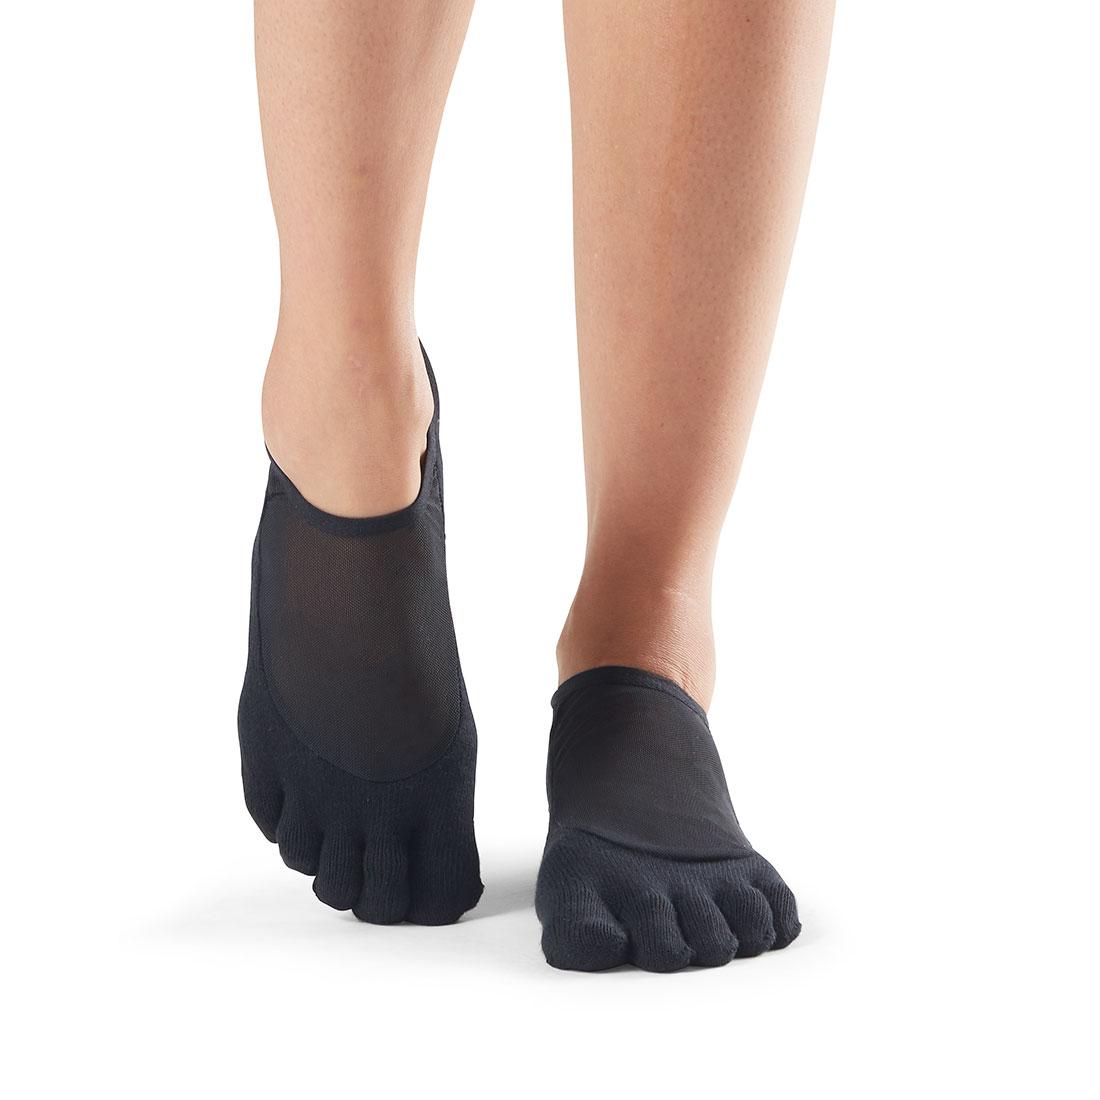 Yogasocken ToeSox Luna Full Toe Black - 1